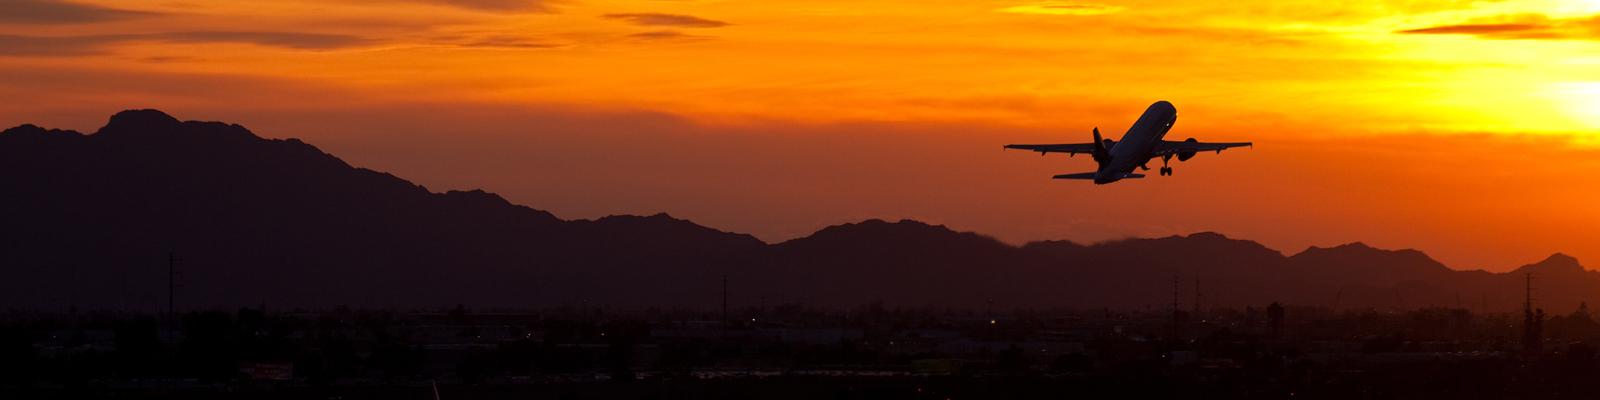 Plane silhouette sunset